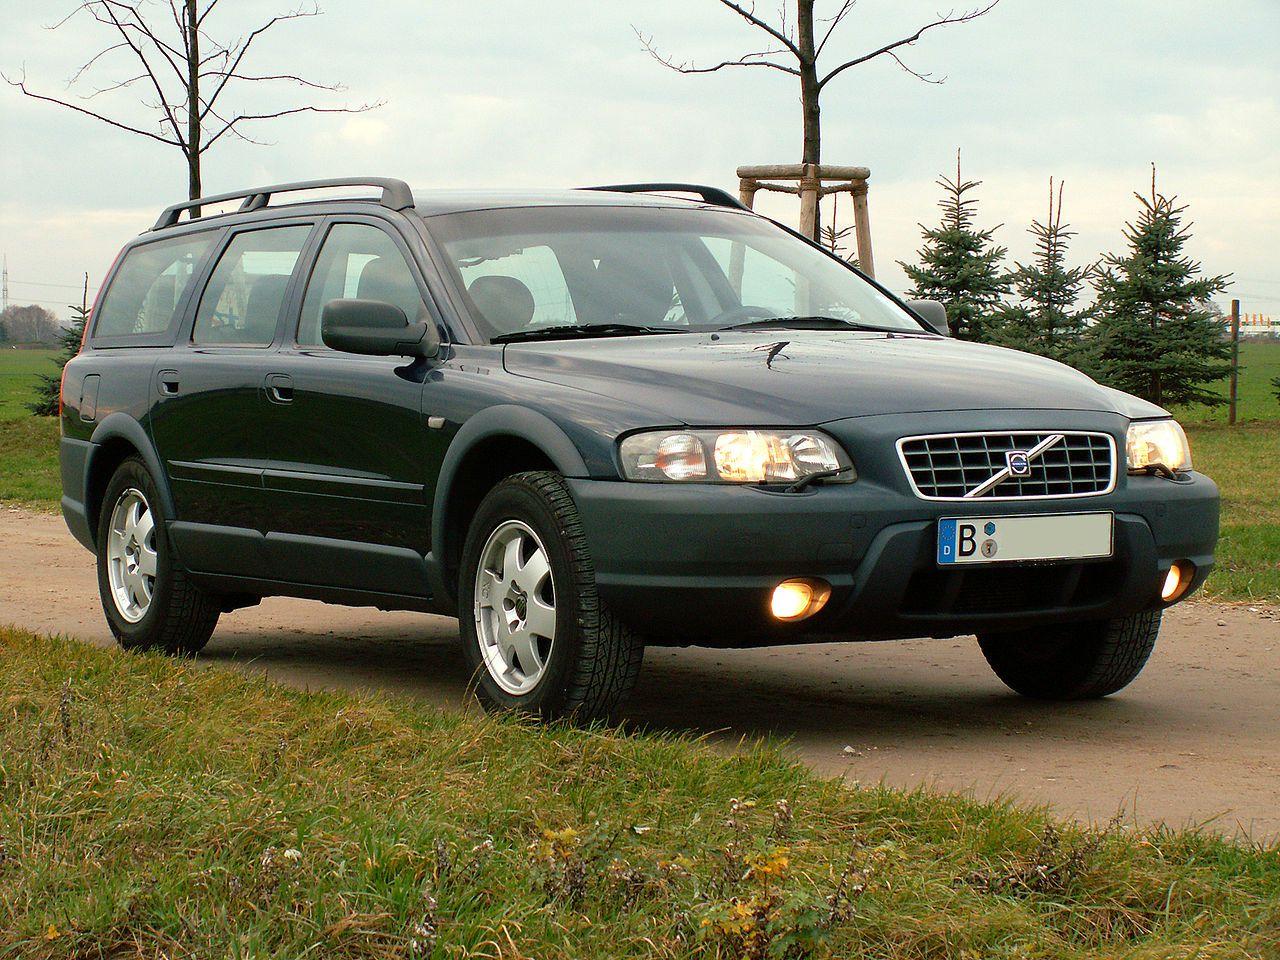 VolvoXC70 - Volvo V70 - Wikipedia, the free encyclopedia